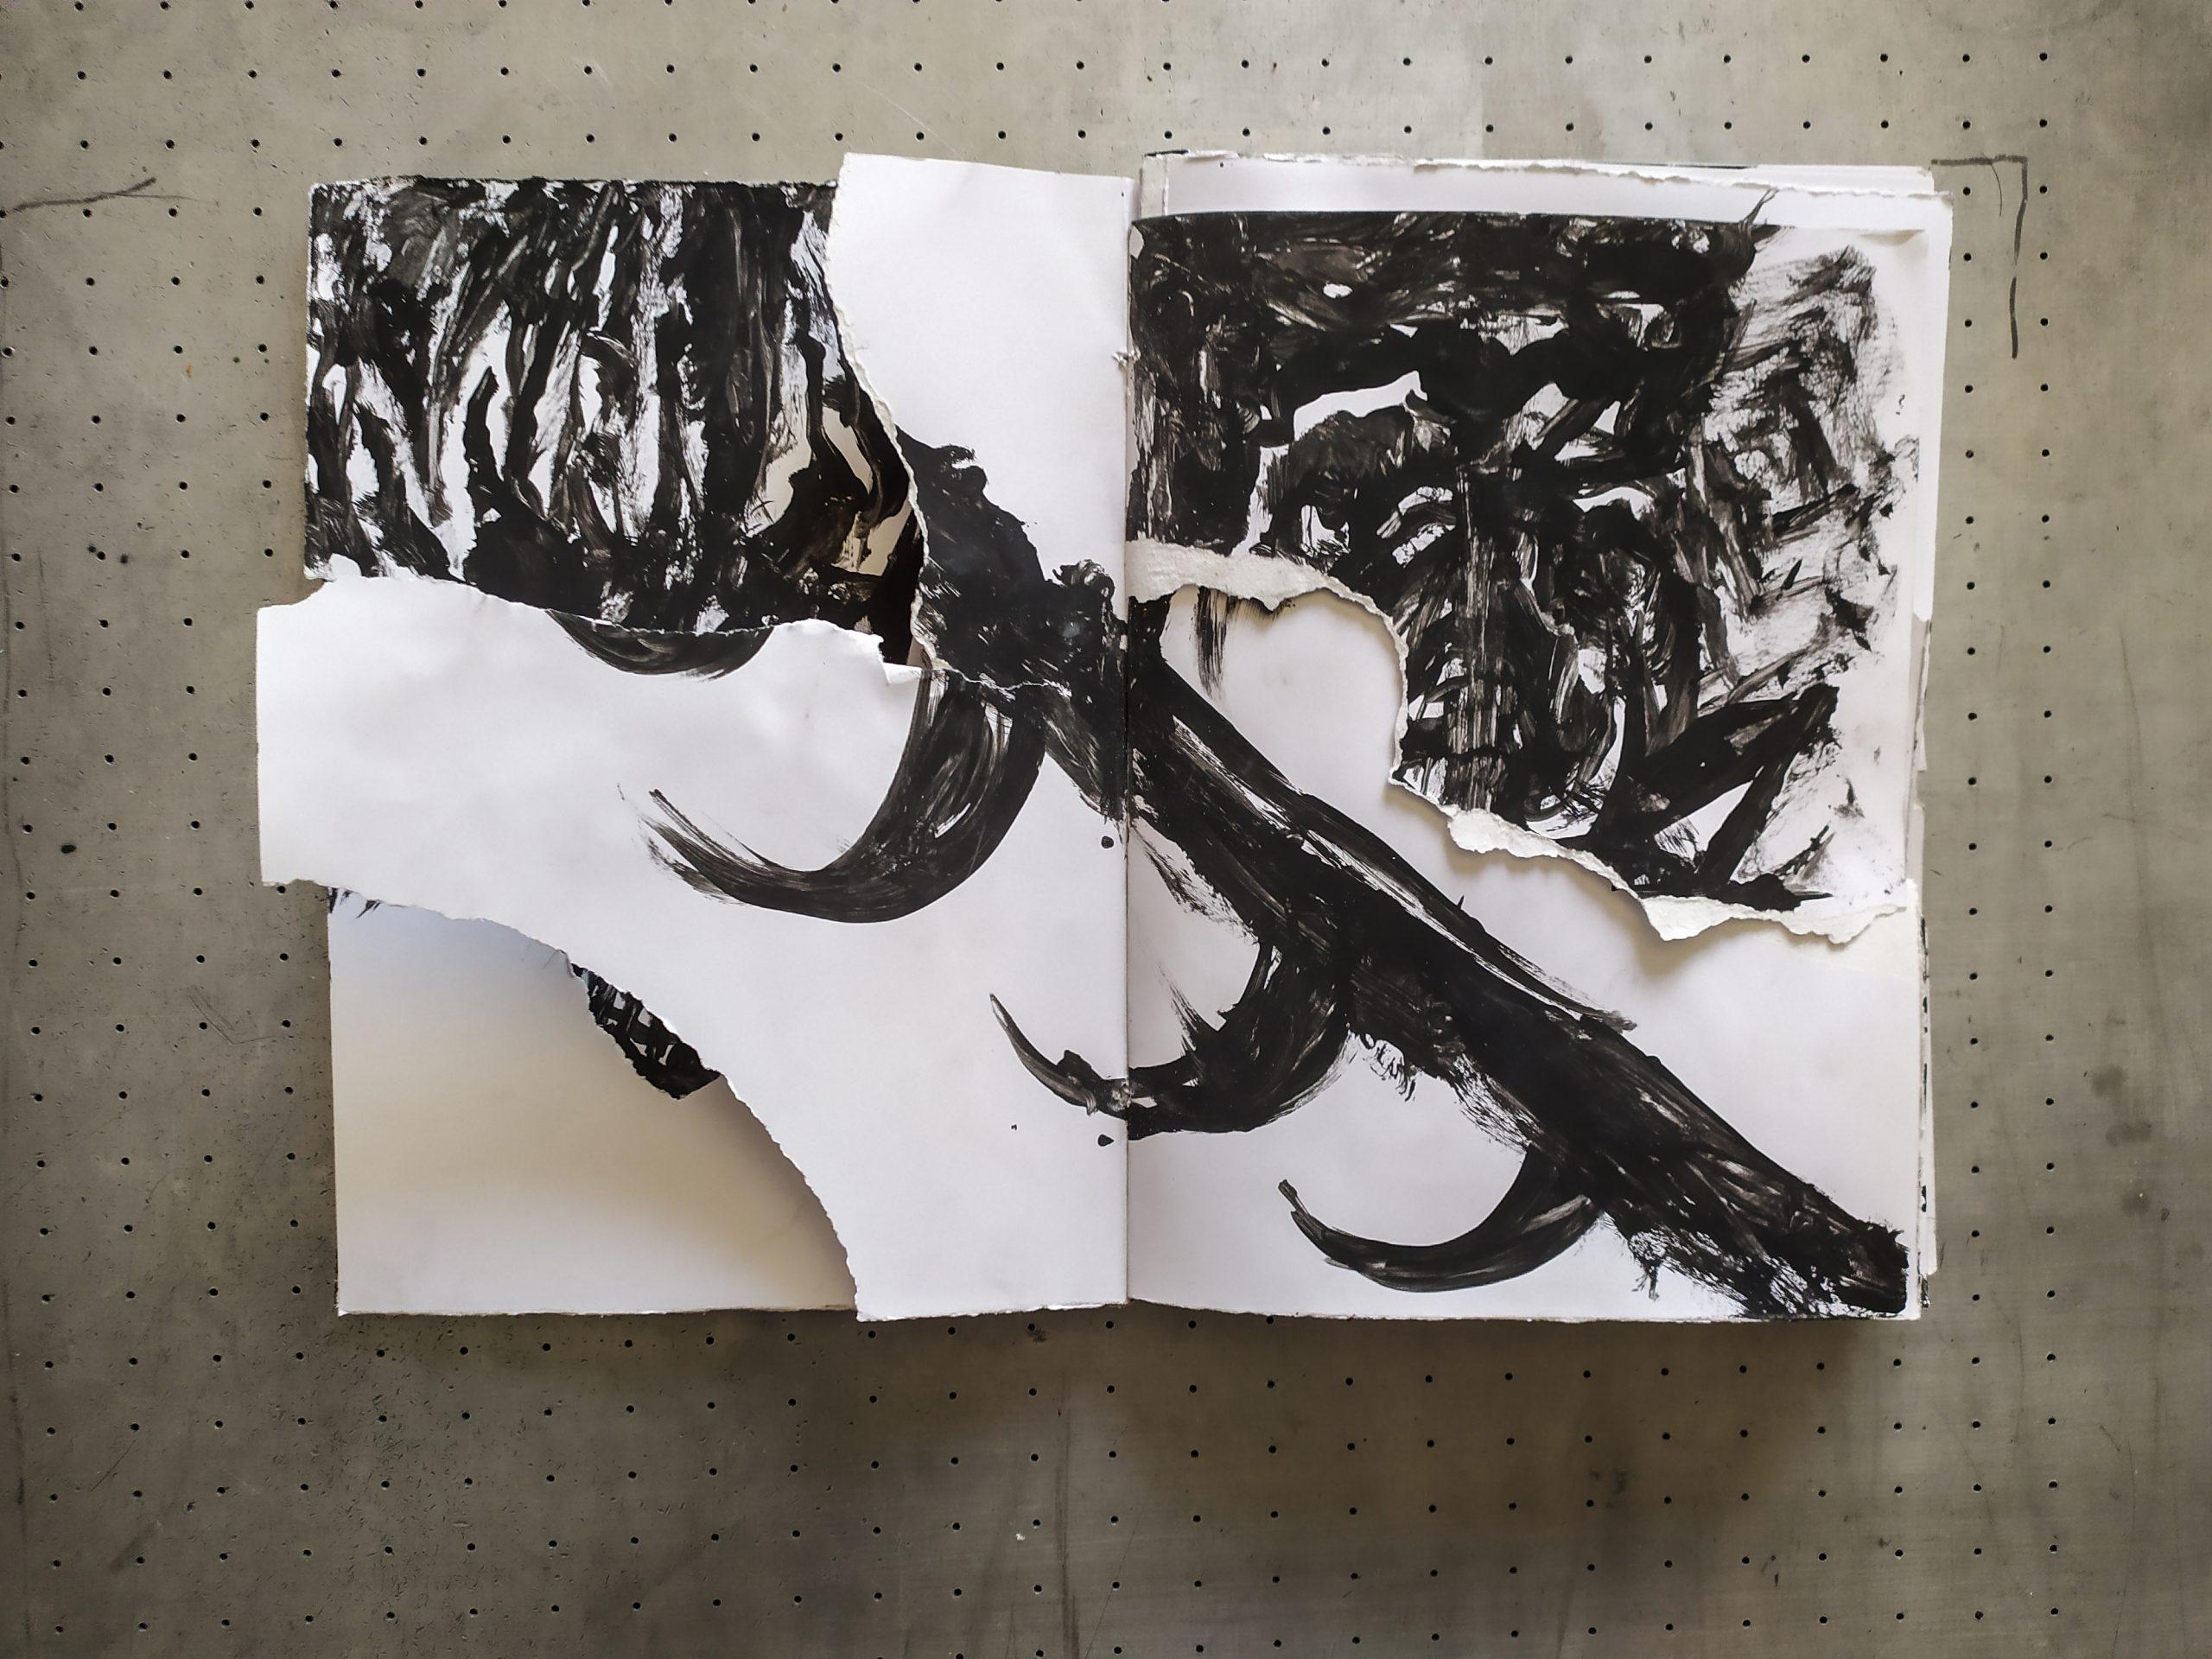 artistbook-sep-2021-carloszorromono-7